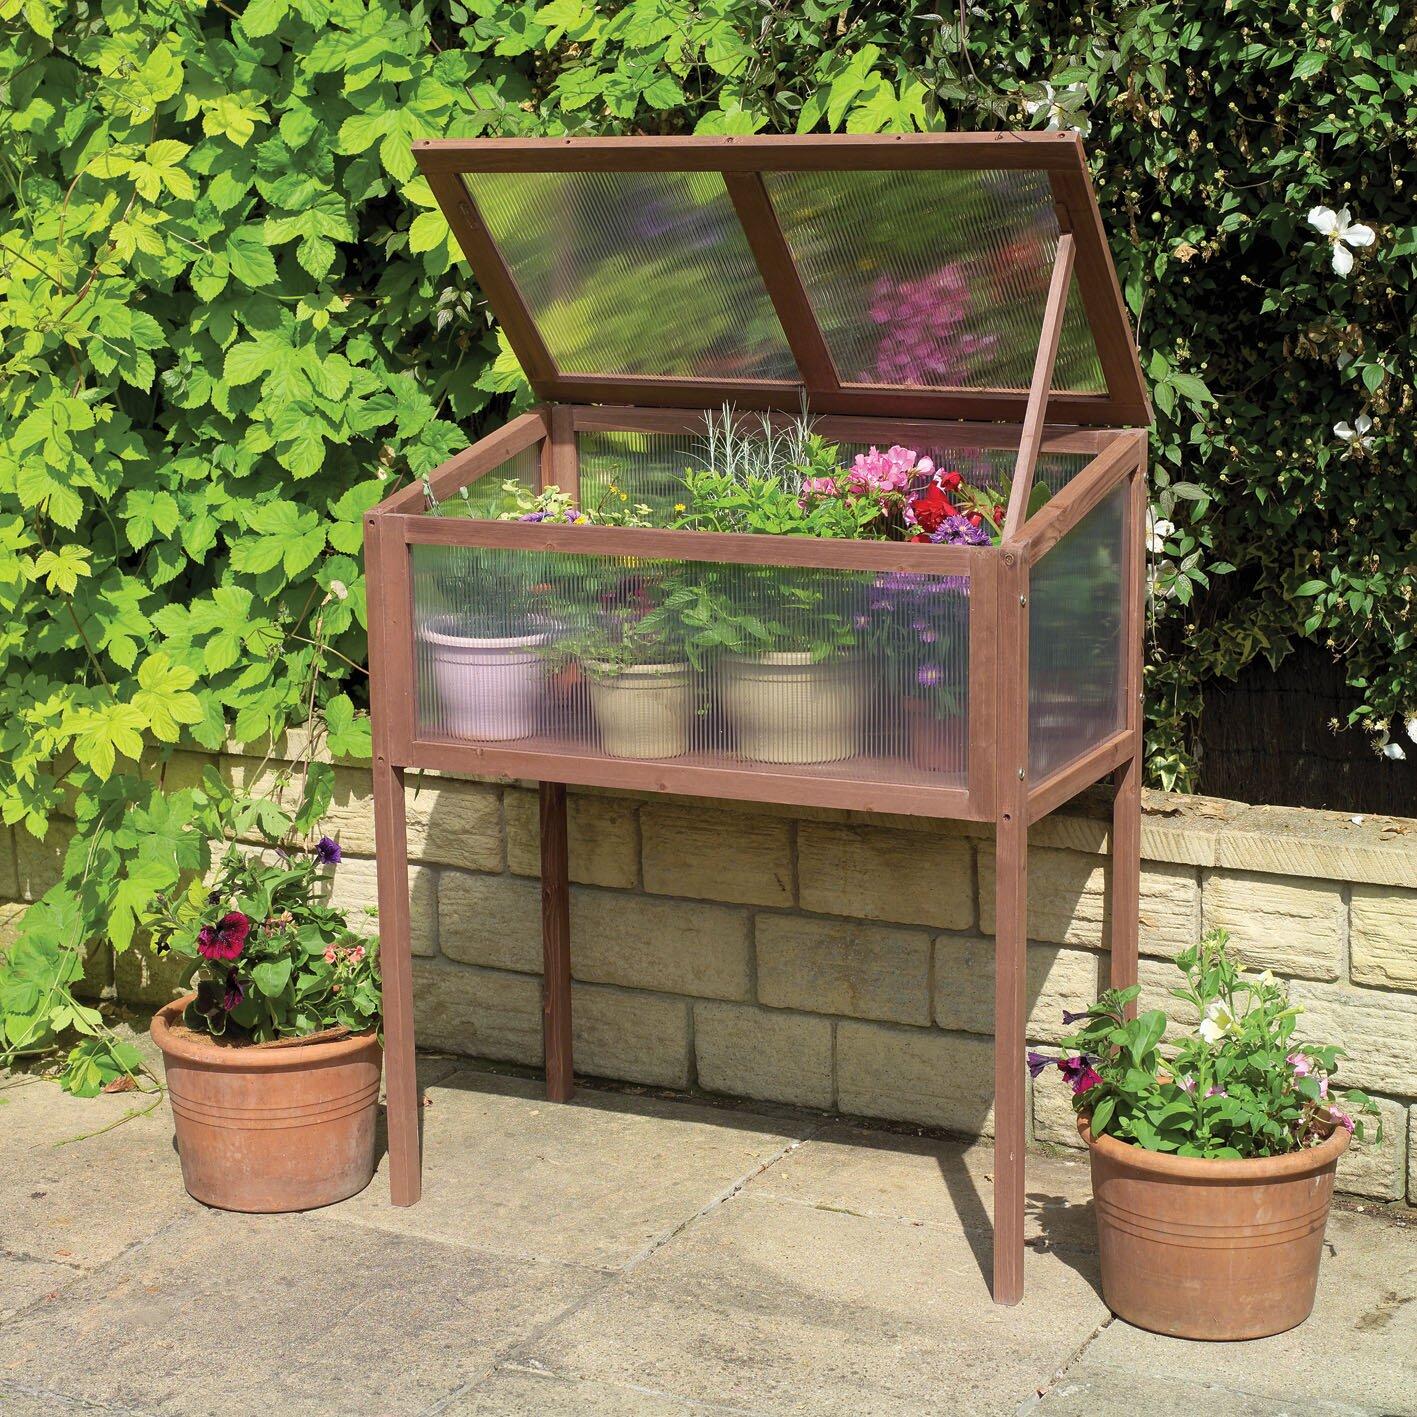 gardman 35 ft w x 3 ft d cold frame greenhouse